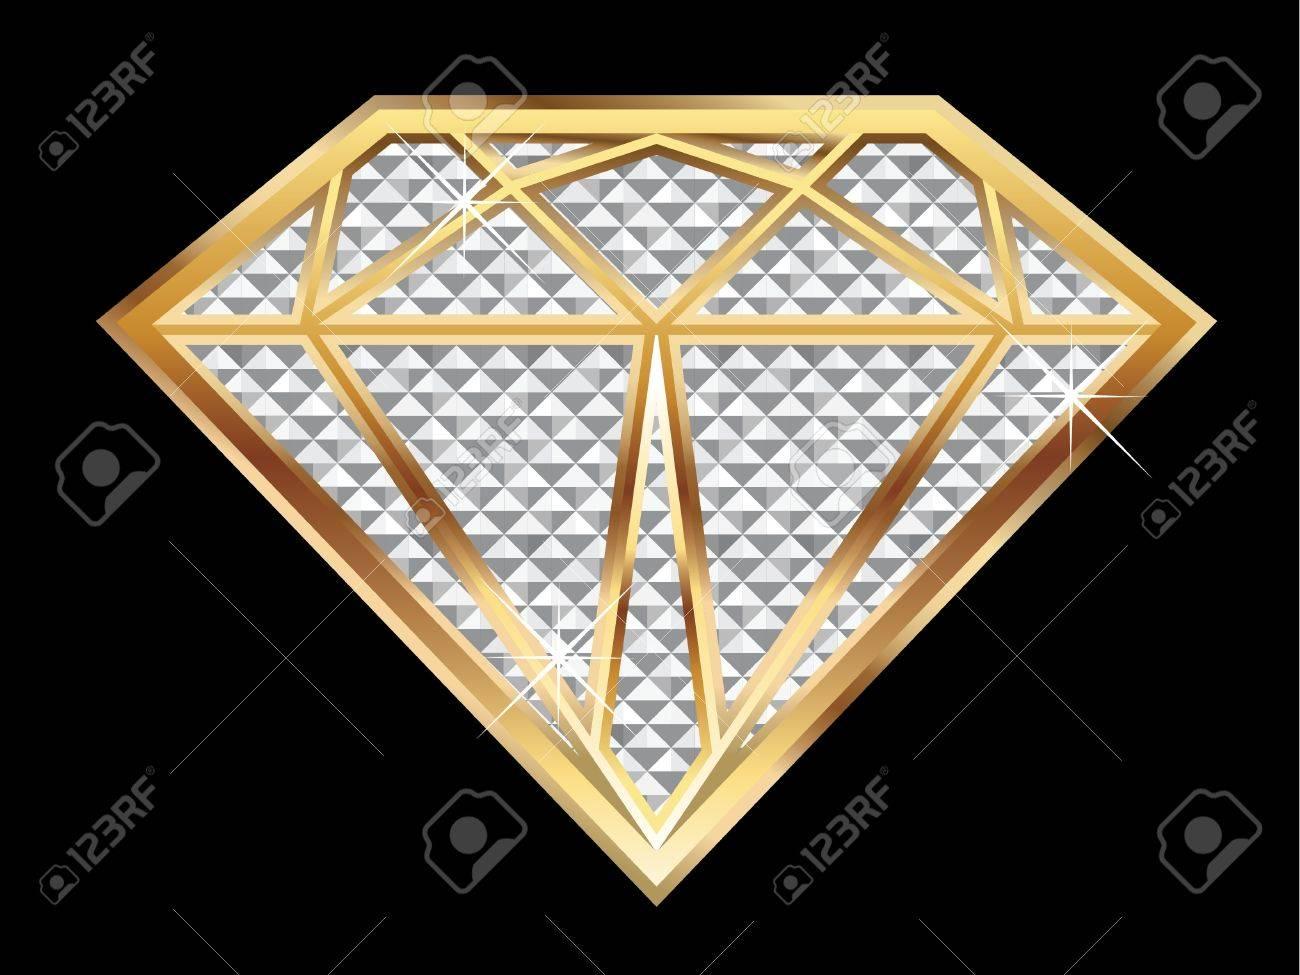 Diamond Stock Vector - 9835977